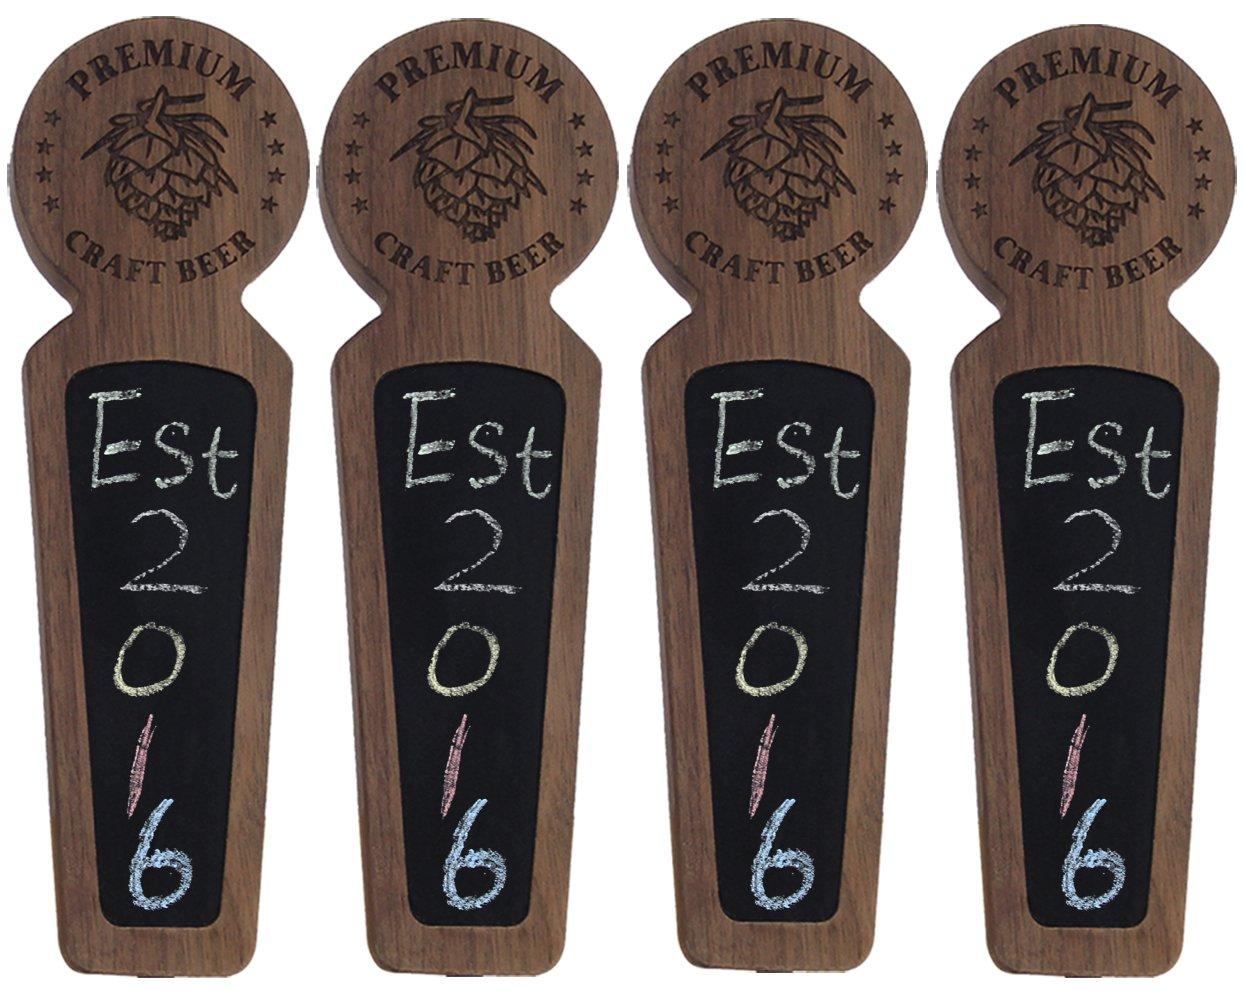 Beer taps handle Set of 4, Kegerator Beer Tap Handles with chalkboard, Unique Wooden Beer Taps 8.3'' Length, Premium Craft Beer, Made of natural Walnut Wood … by Sweetheart (Image #1)